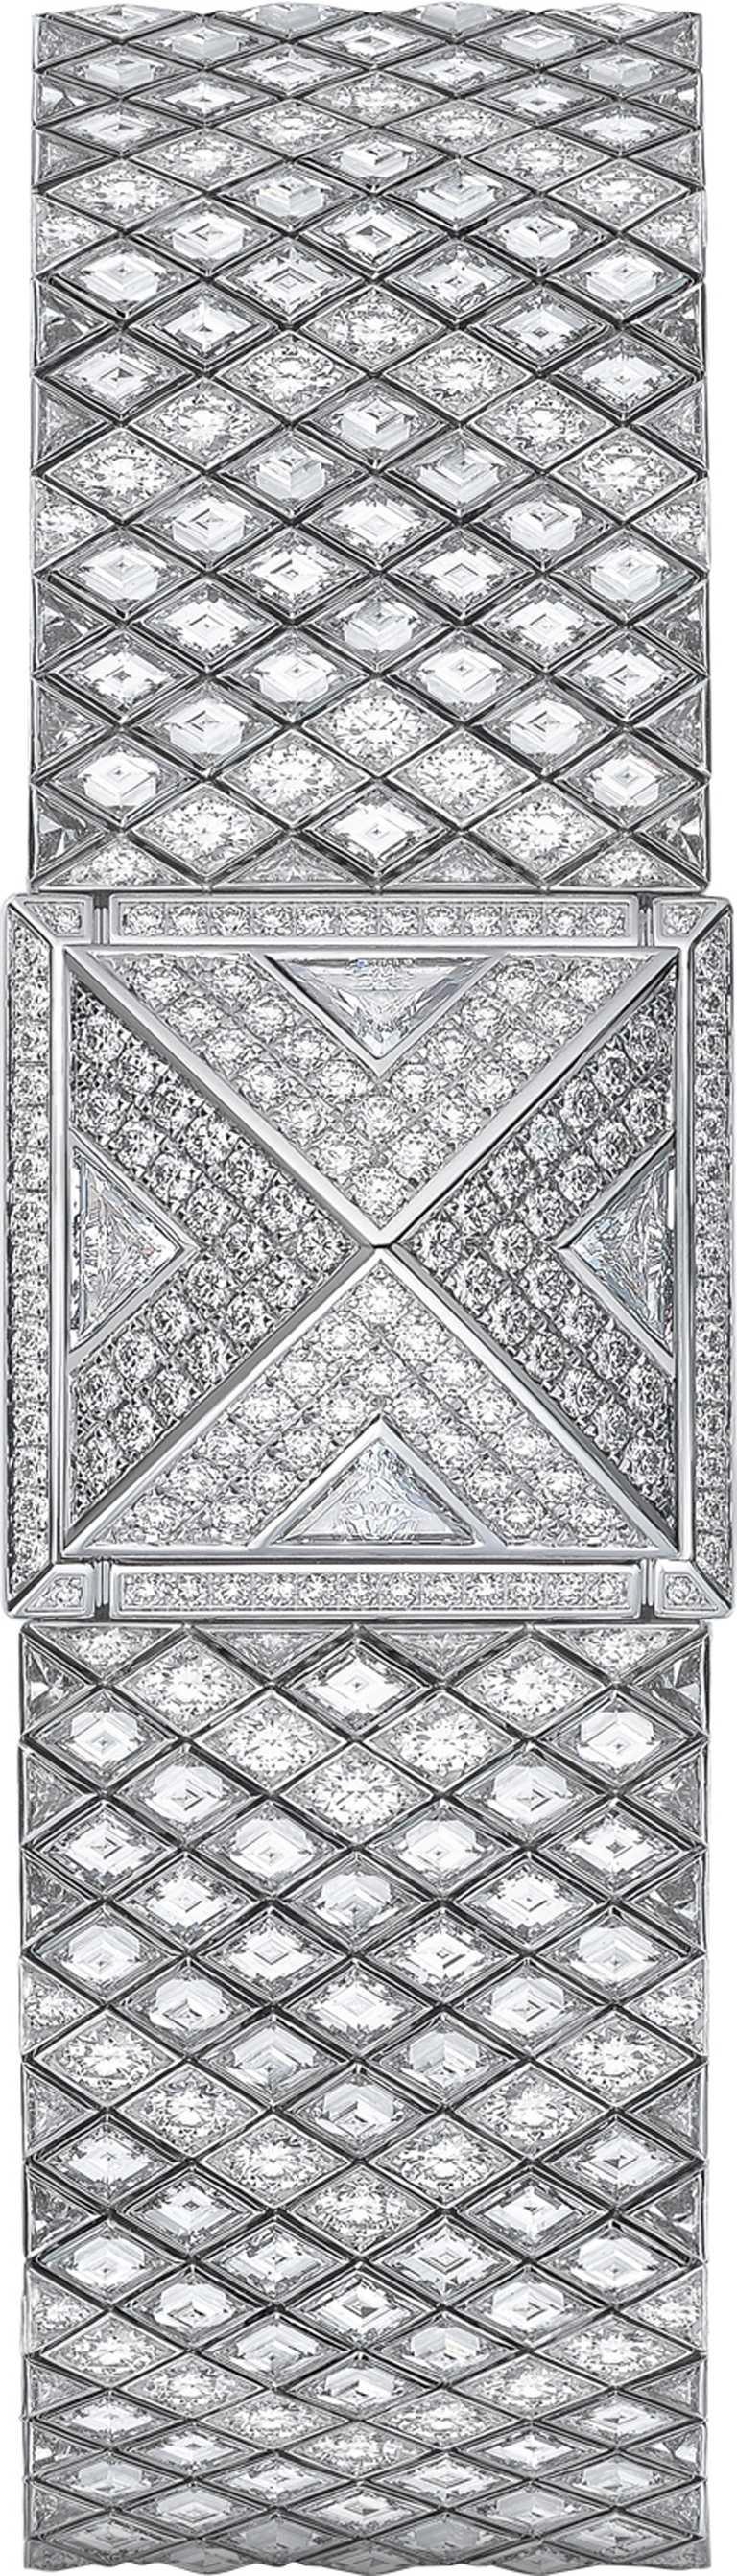 HERMÈS「MÉDOR Haute Joaillerie」頂級珠寶腕錶,750白金錶殼,瑞士製石英機芯,18.4mm,鑽石835顆,僅接受訂製╱價格店洽。(圖╱HERMÈS提供)